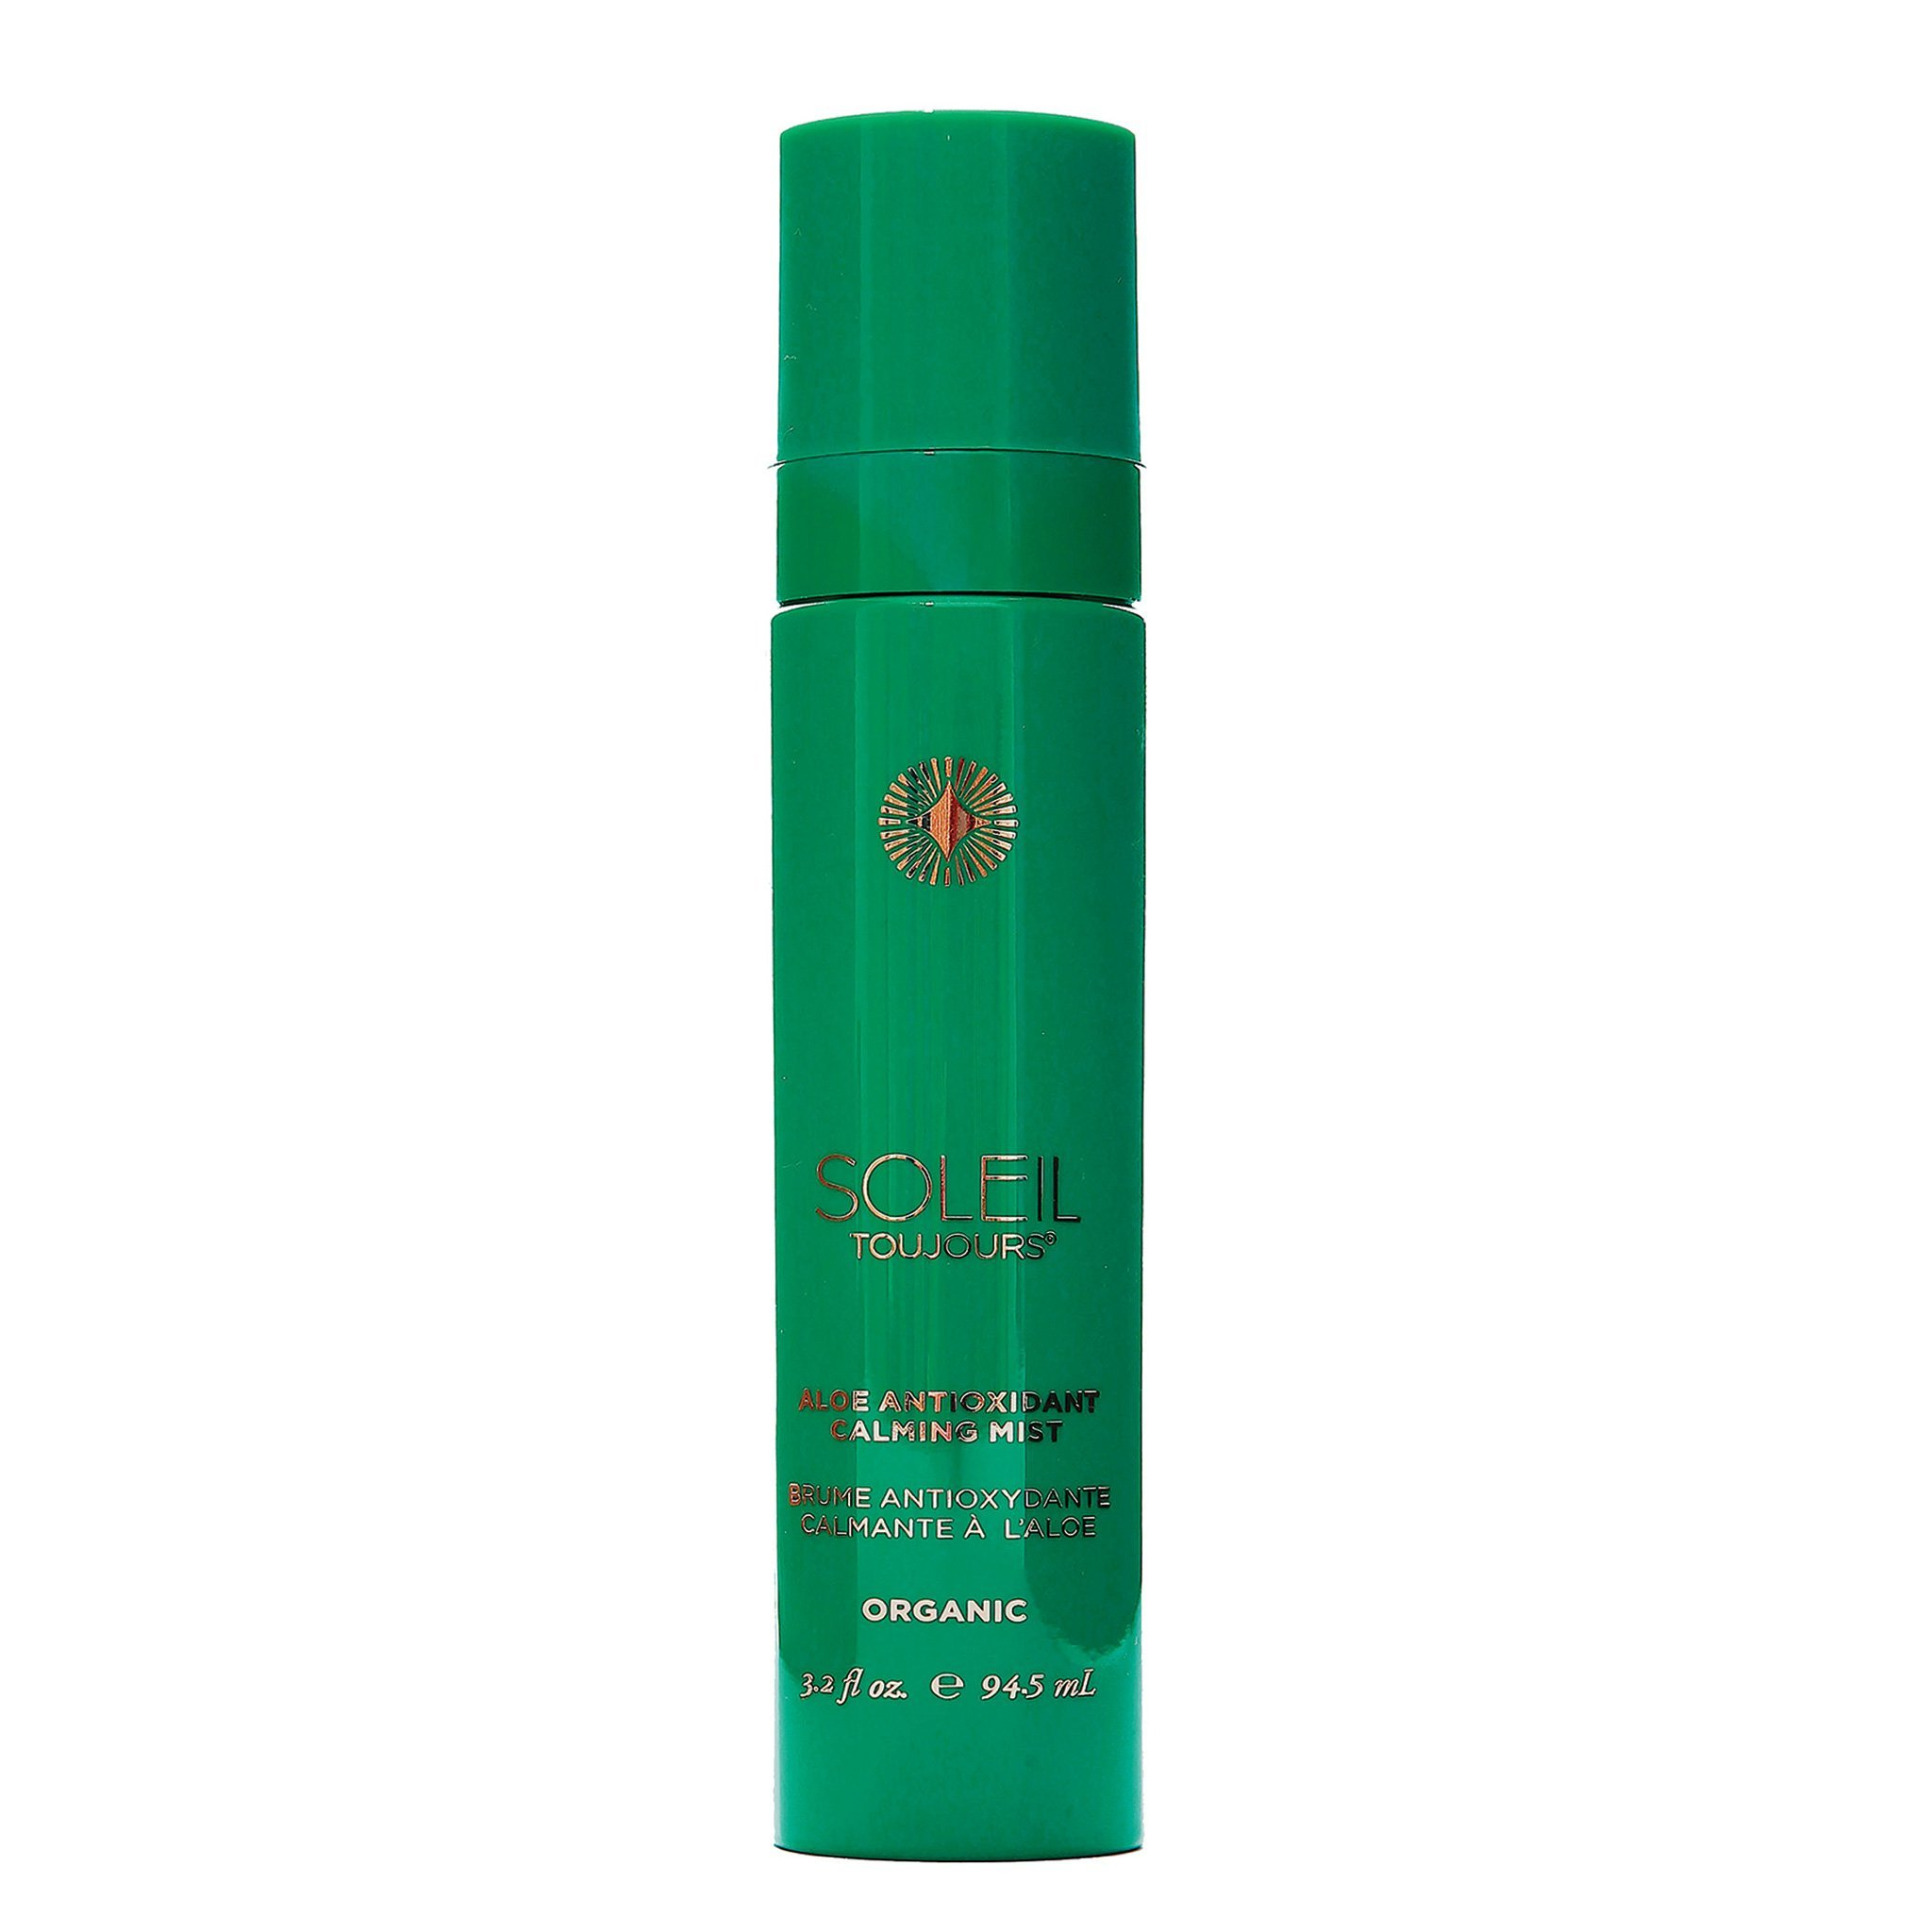 Soleil Toujours Organic 100% Natural Hypoallergenic Aloe Antioxidant Calming Mist, 3.2 Fl. Oz.